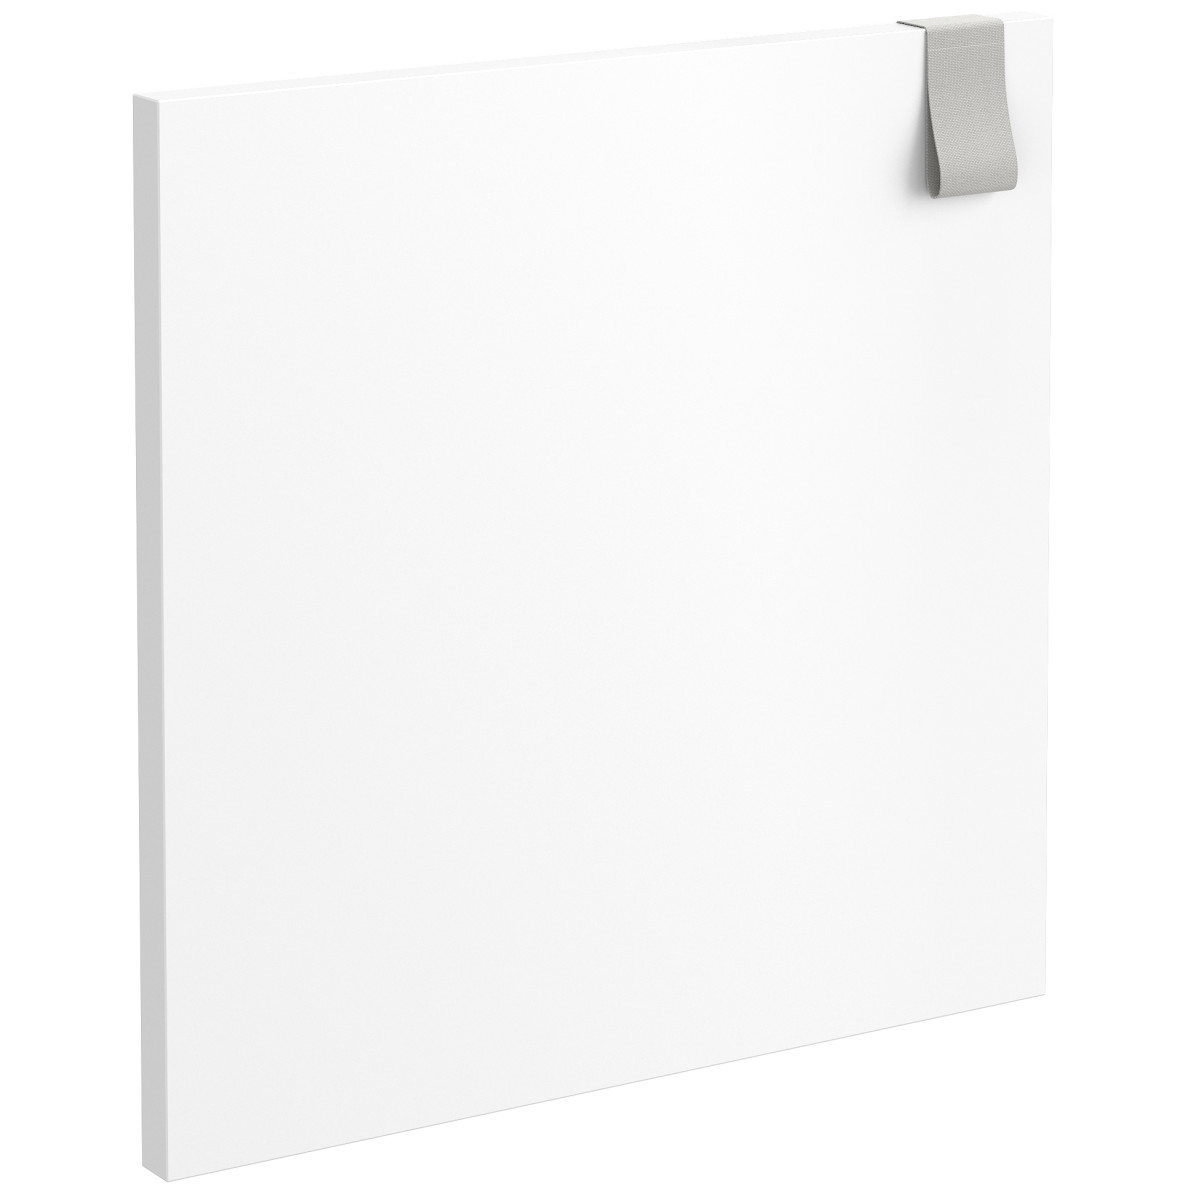 Фасад SPACEO KUB 40х32.2 см ЛДСП цвет белый